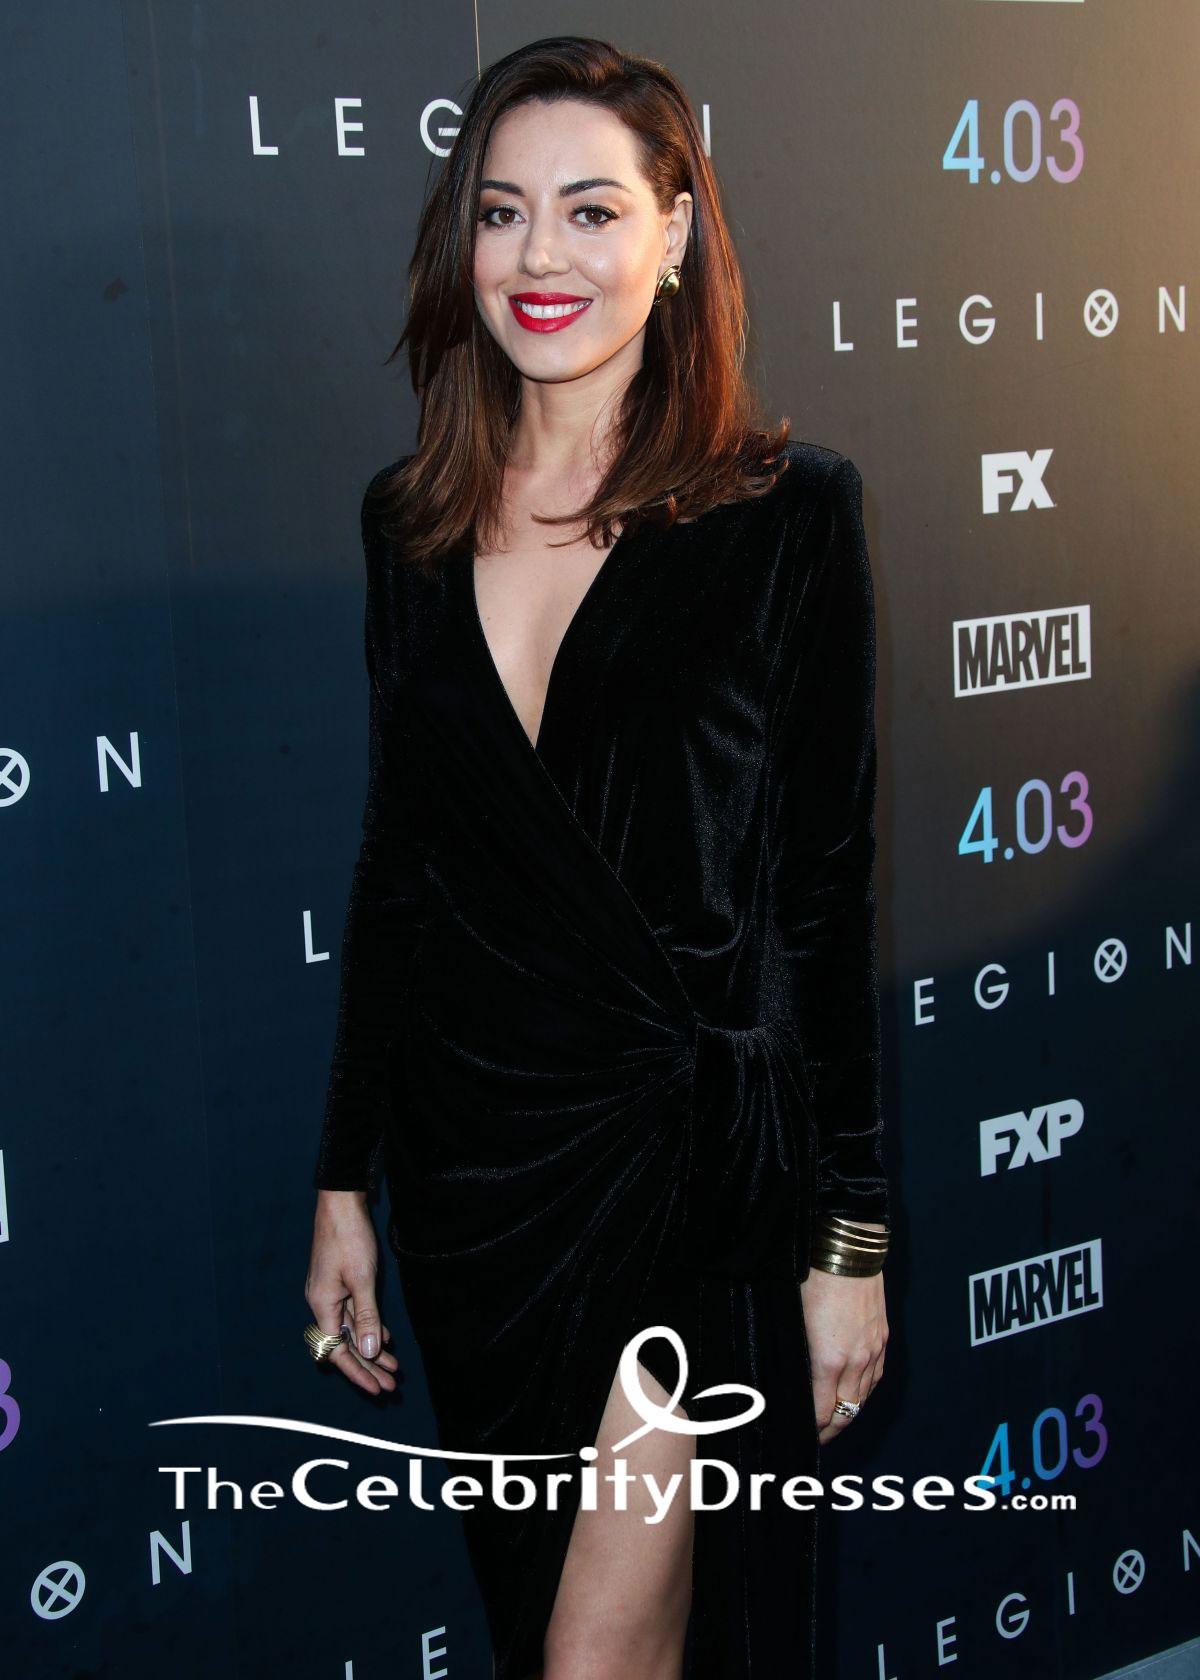 Aubrey Plaza Long Sleeve Black Party Dress Premiere Of FX's 'Legion' Season 2 - TheCelebrityDresses